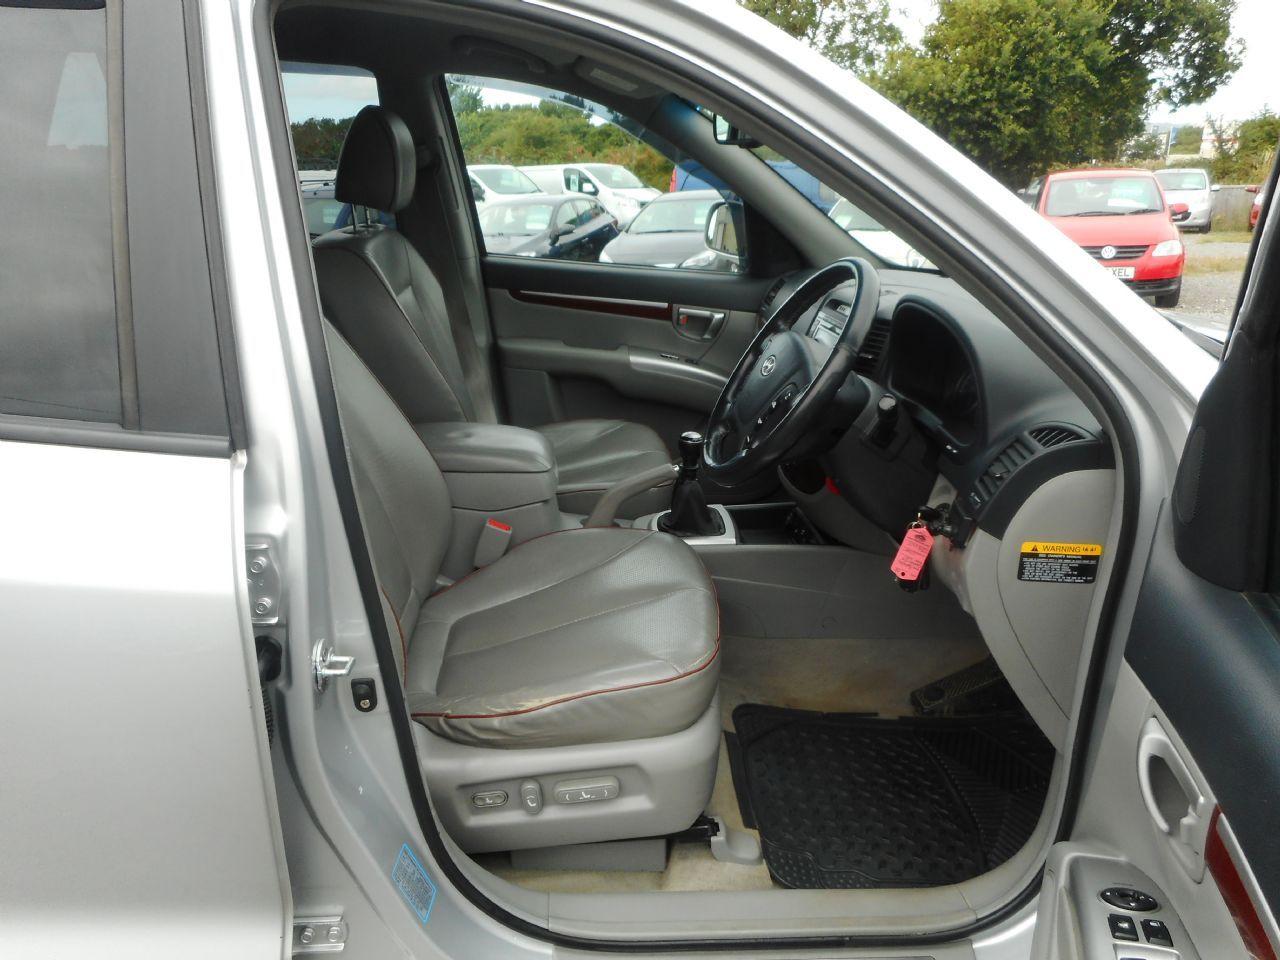 HYUNDAI Santa Fe 2.2 CRTD CDX 5 Seat EU4 (2008) - Picture 11